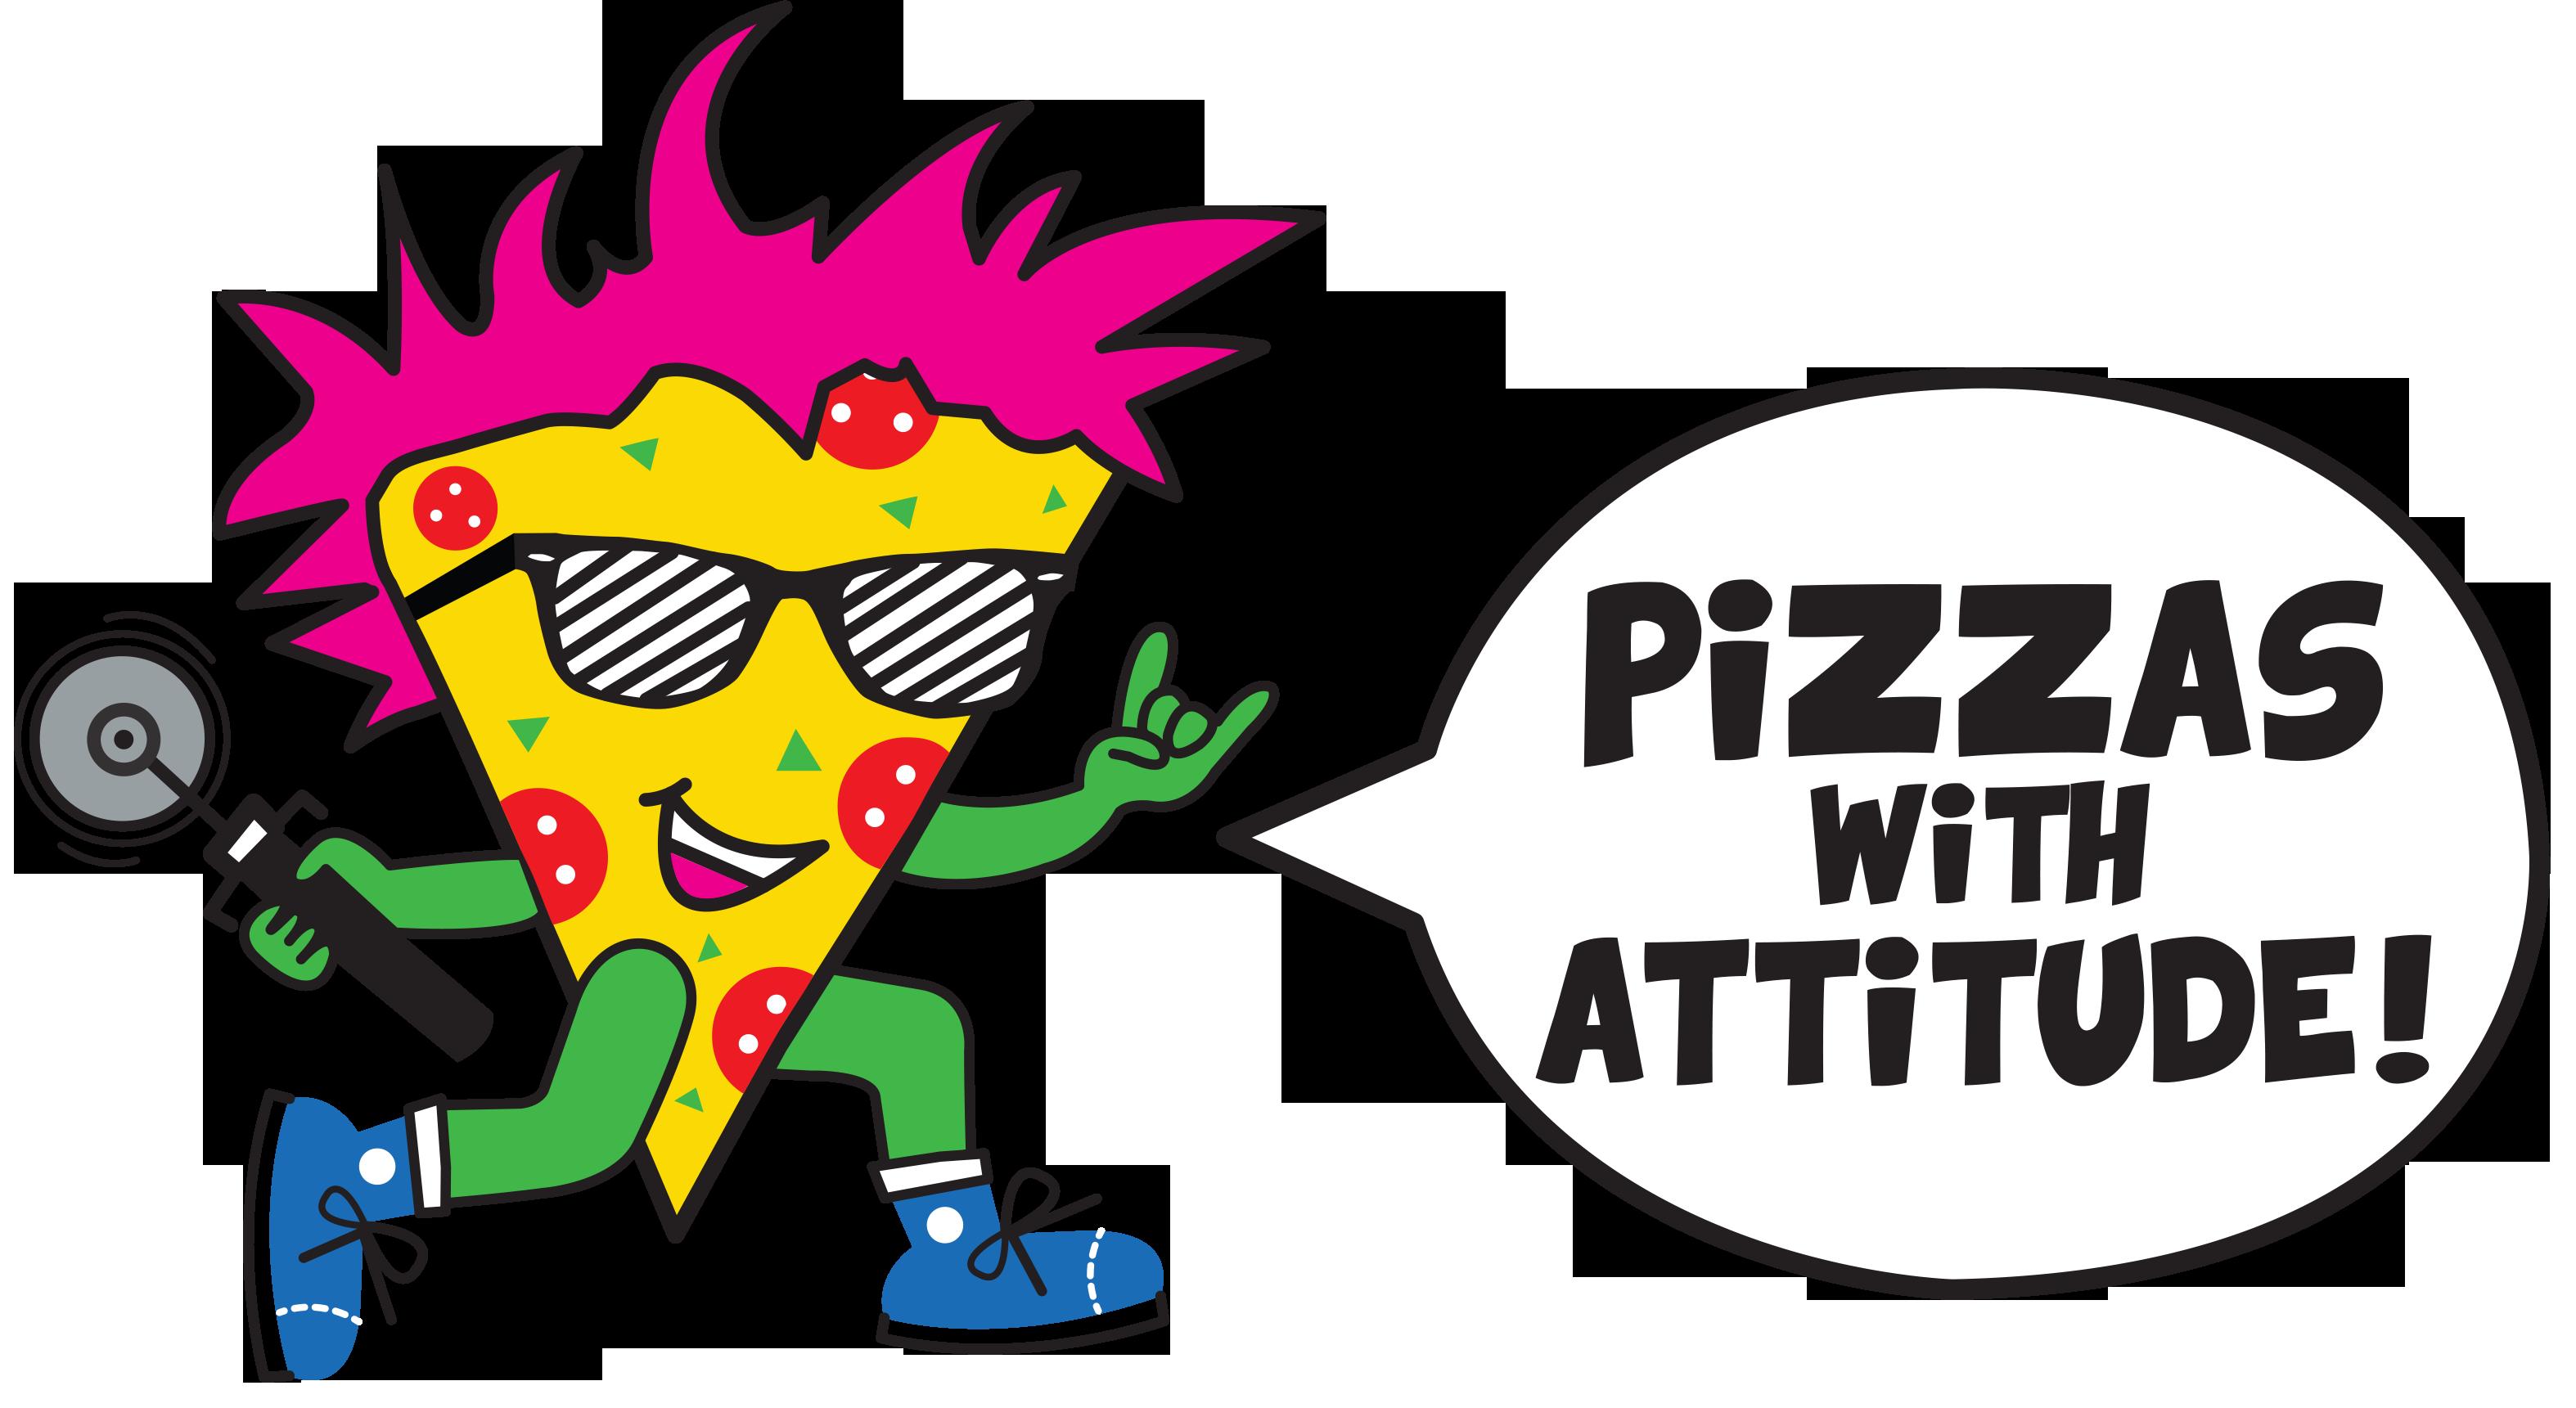 Pizzas with Attitude Leopold